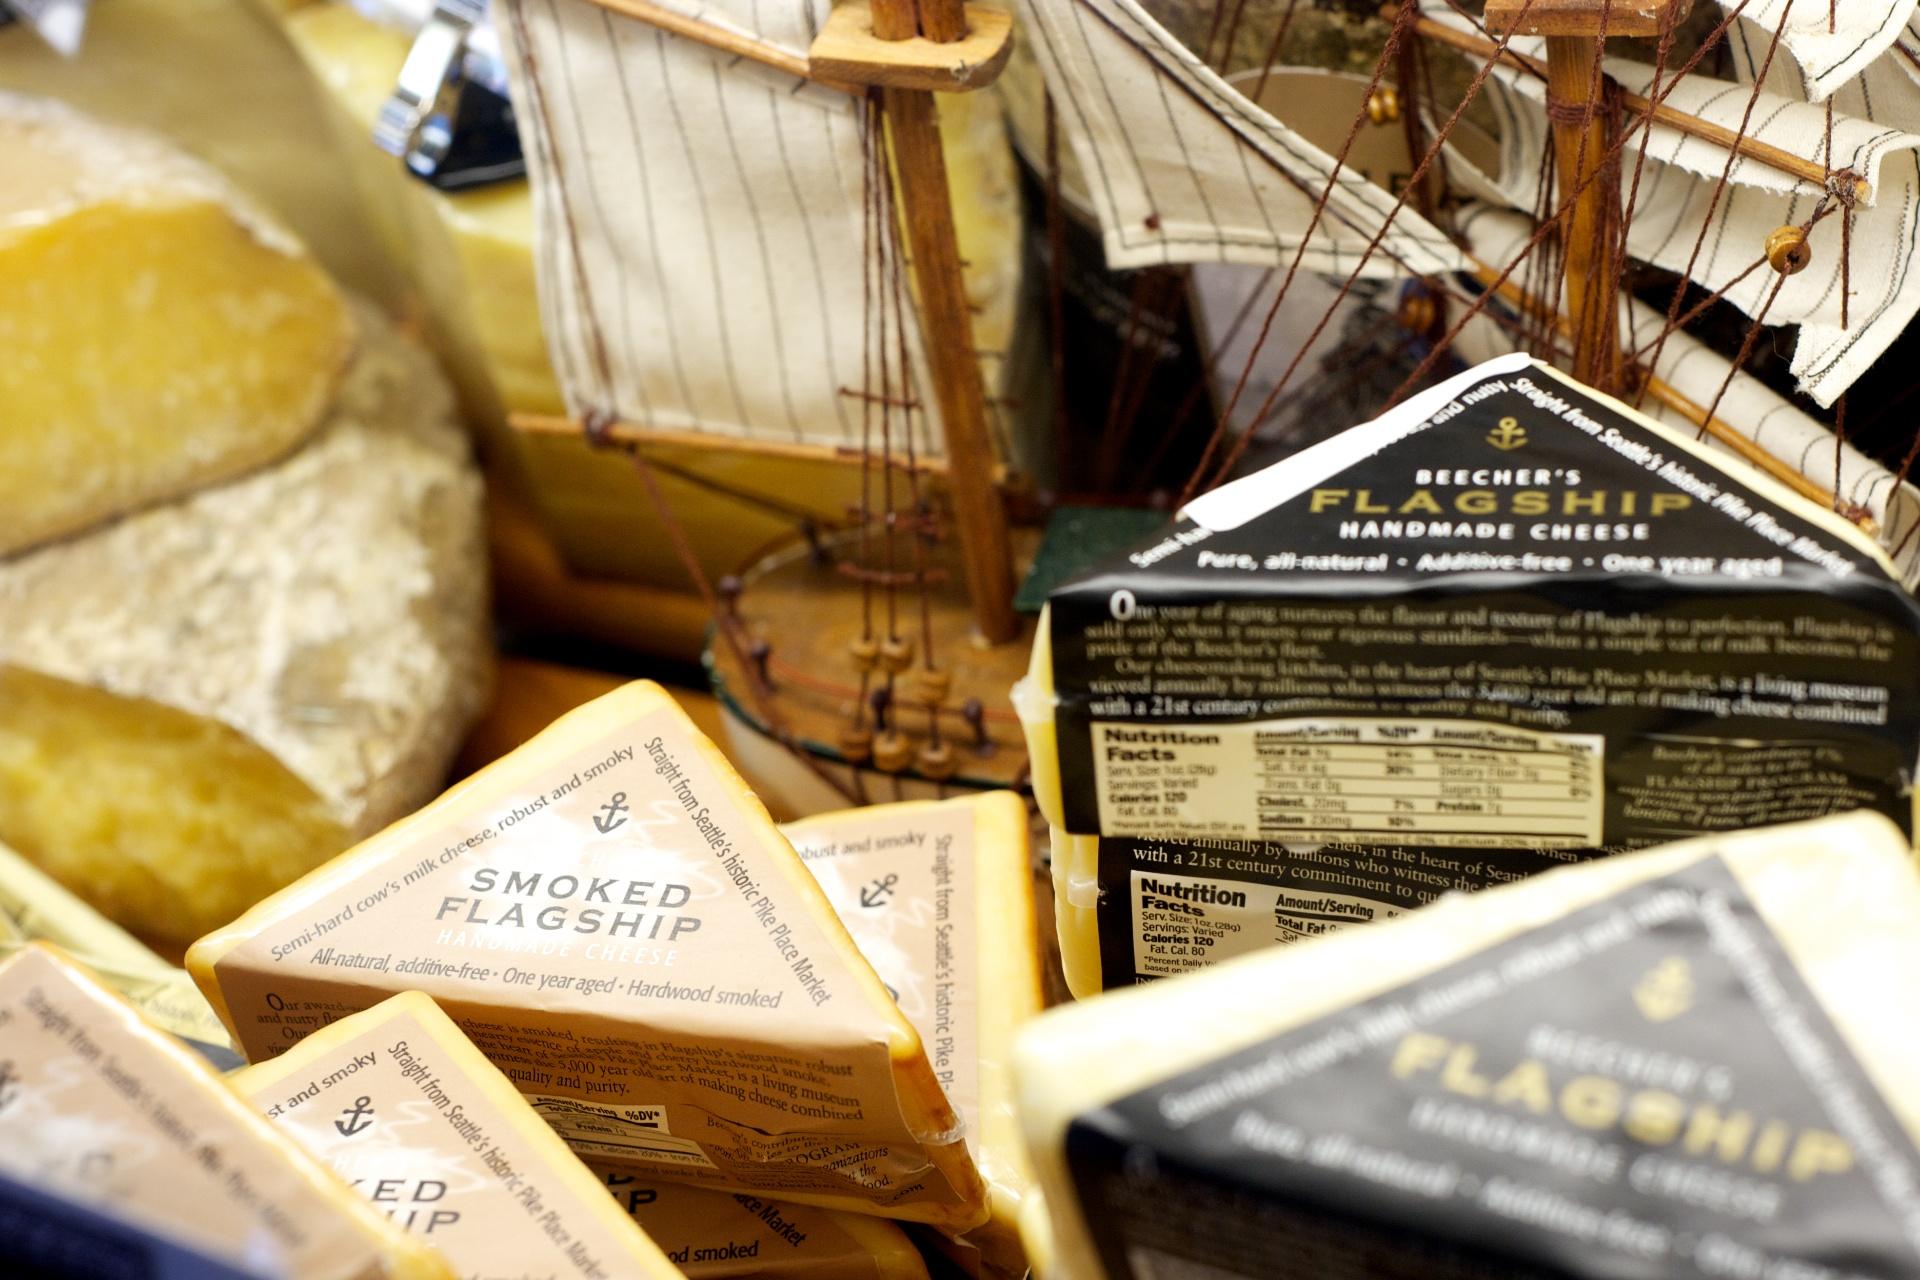 Сыр из Beecher's Handmade Cheese  Пайк Плейс Маркет Сиэтл